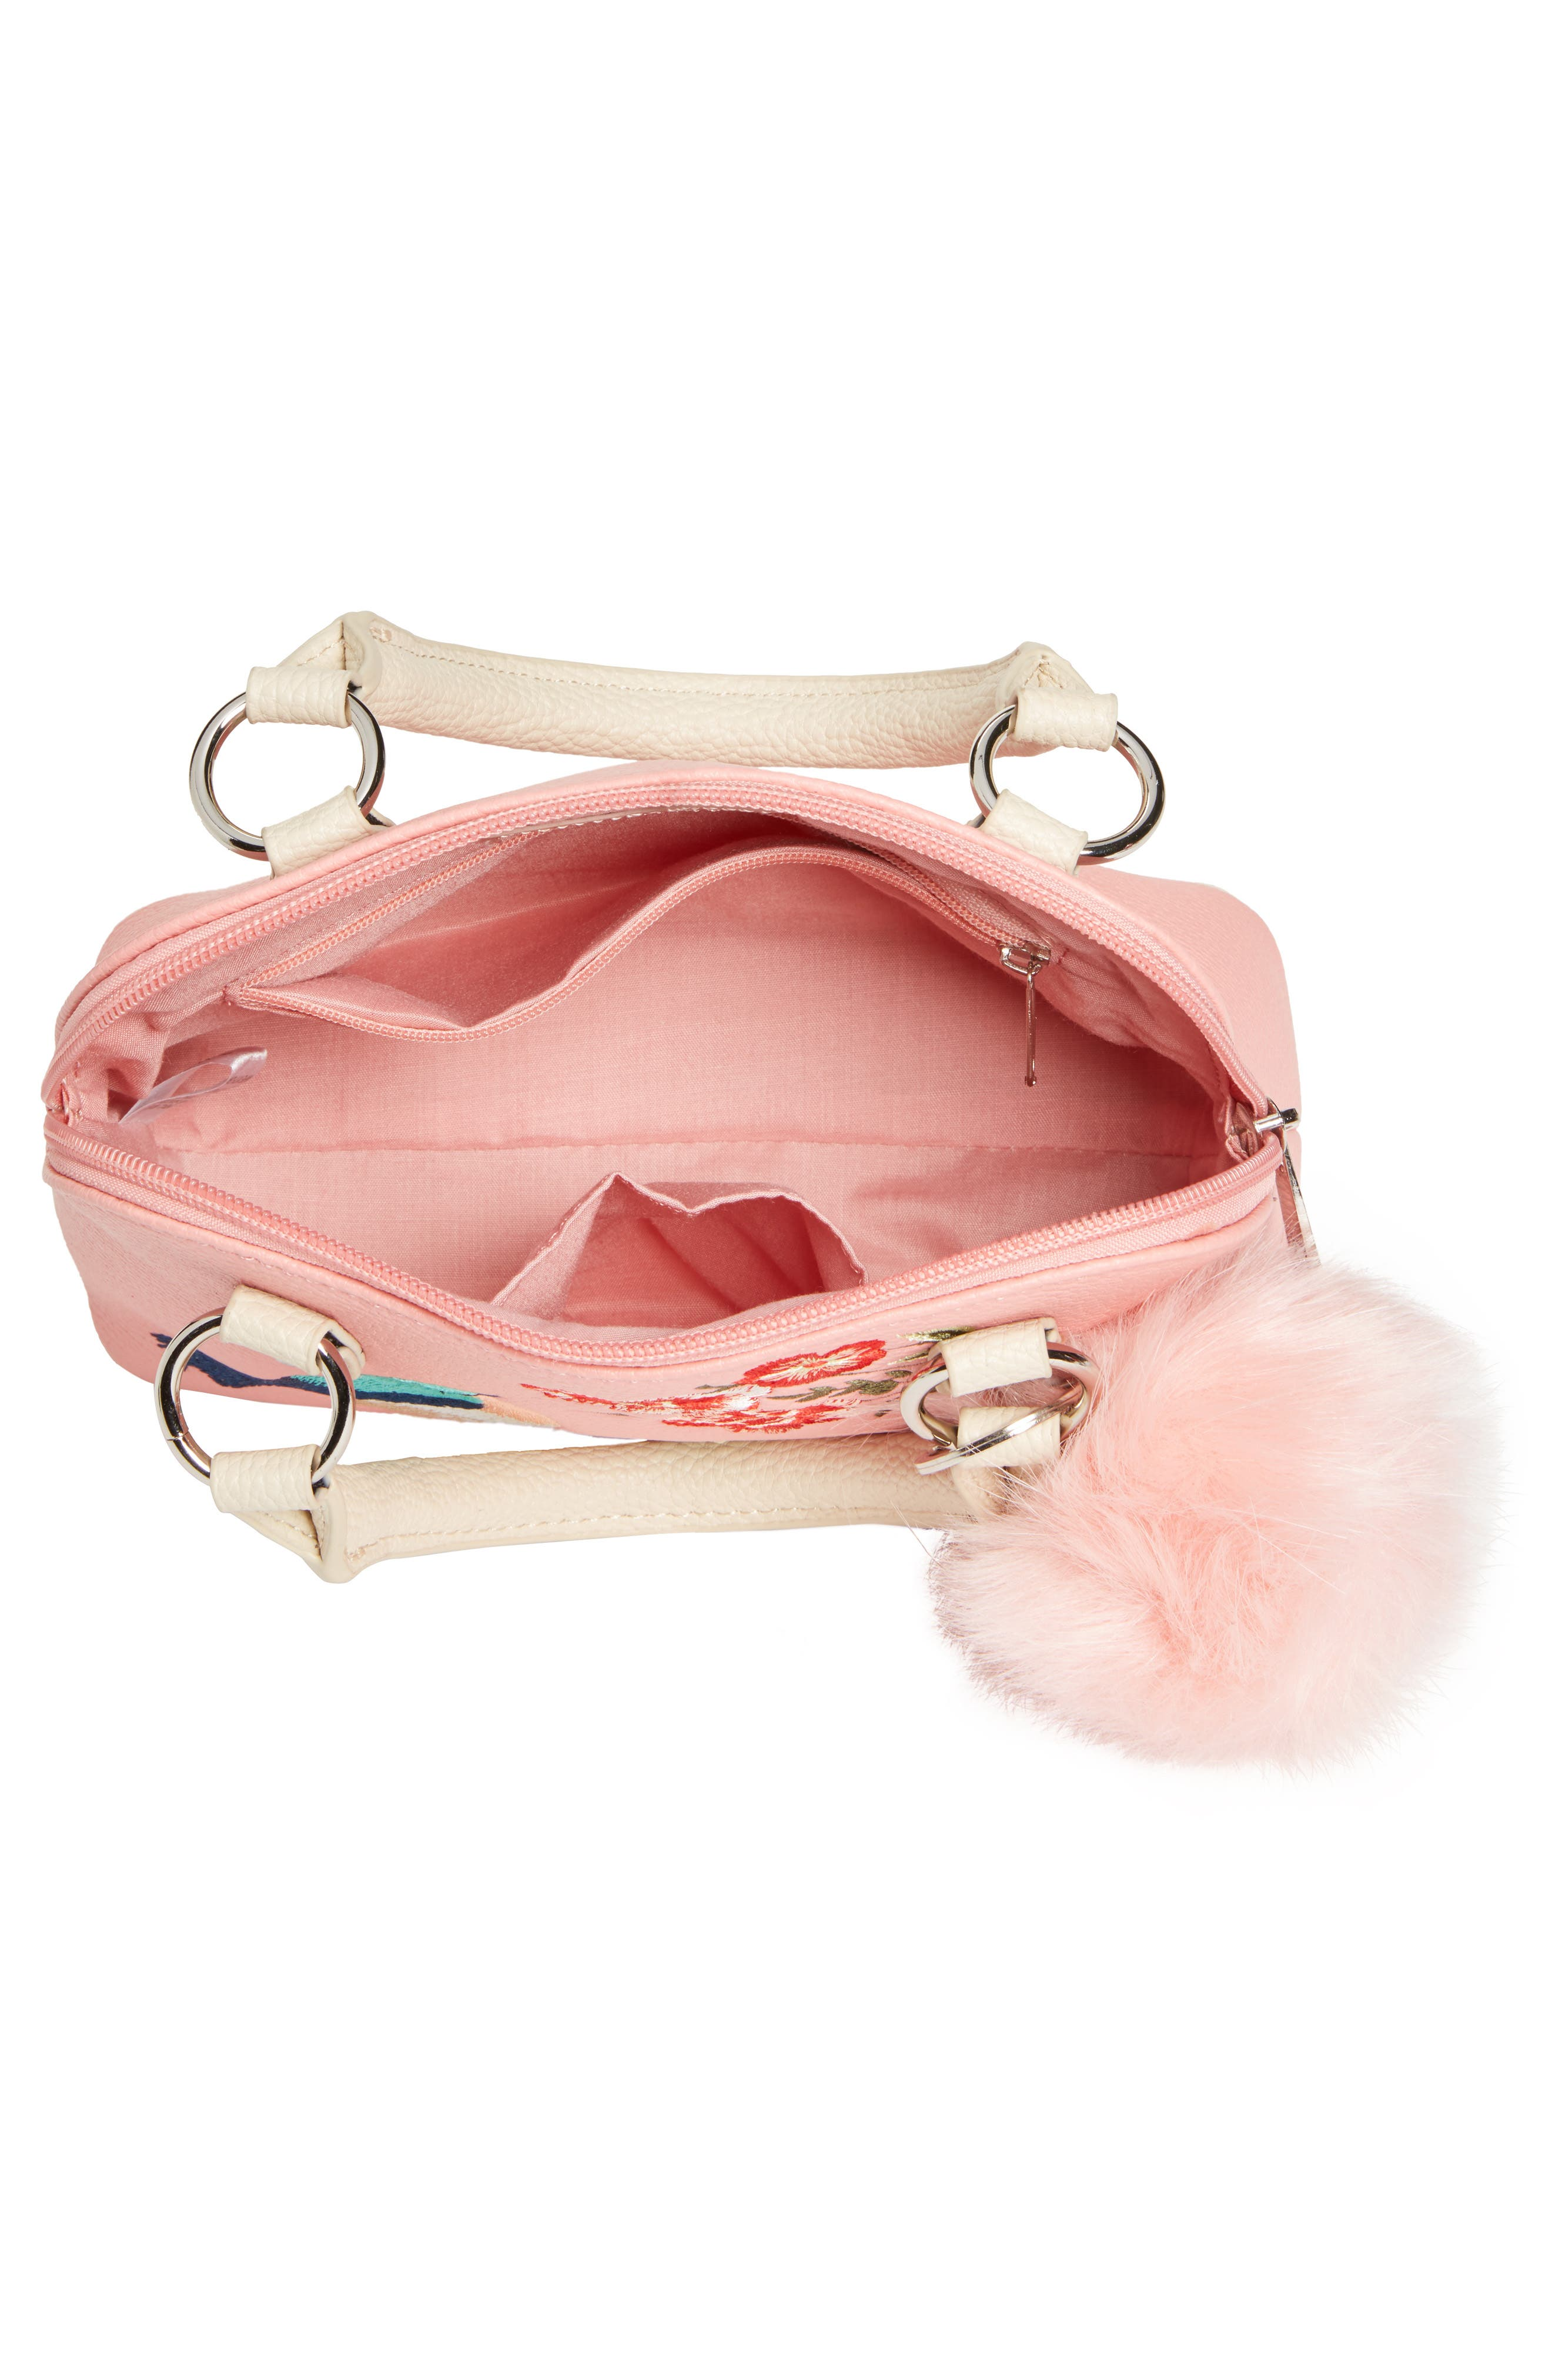 Embroidered Handbag,                             Alternate thumbnail 3, color,                             Pink